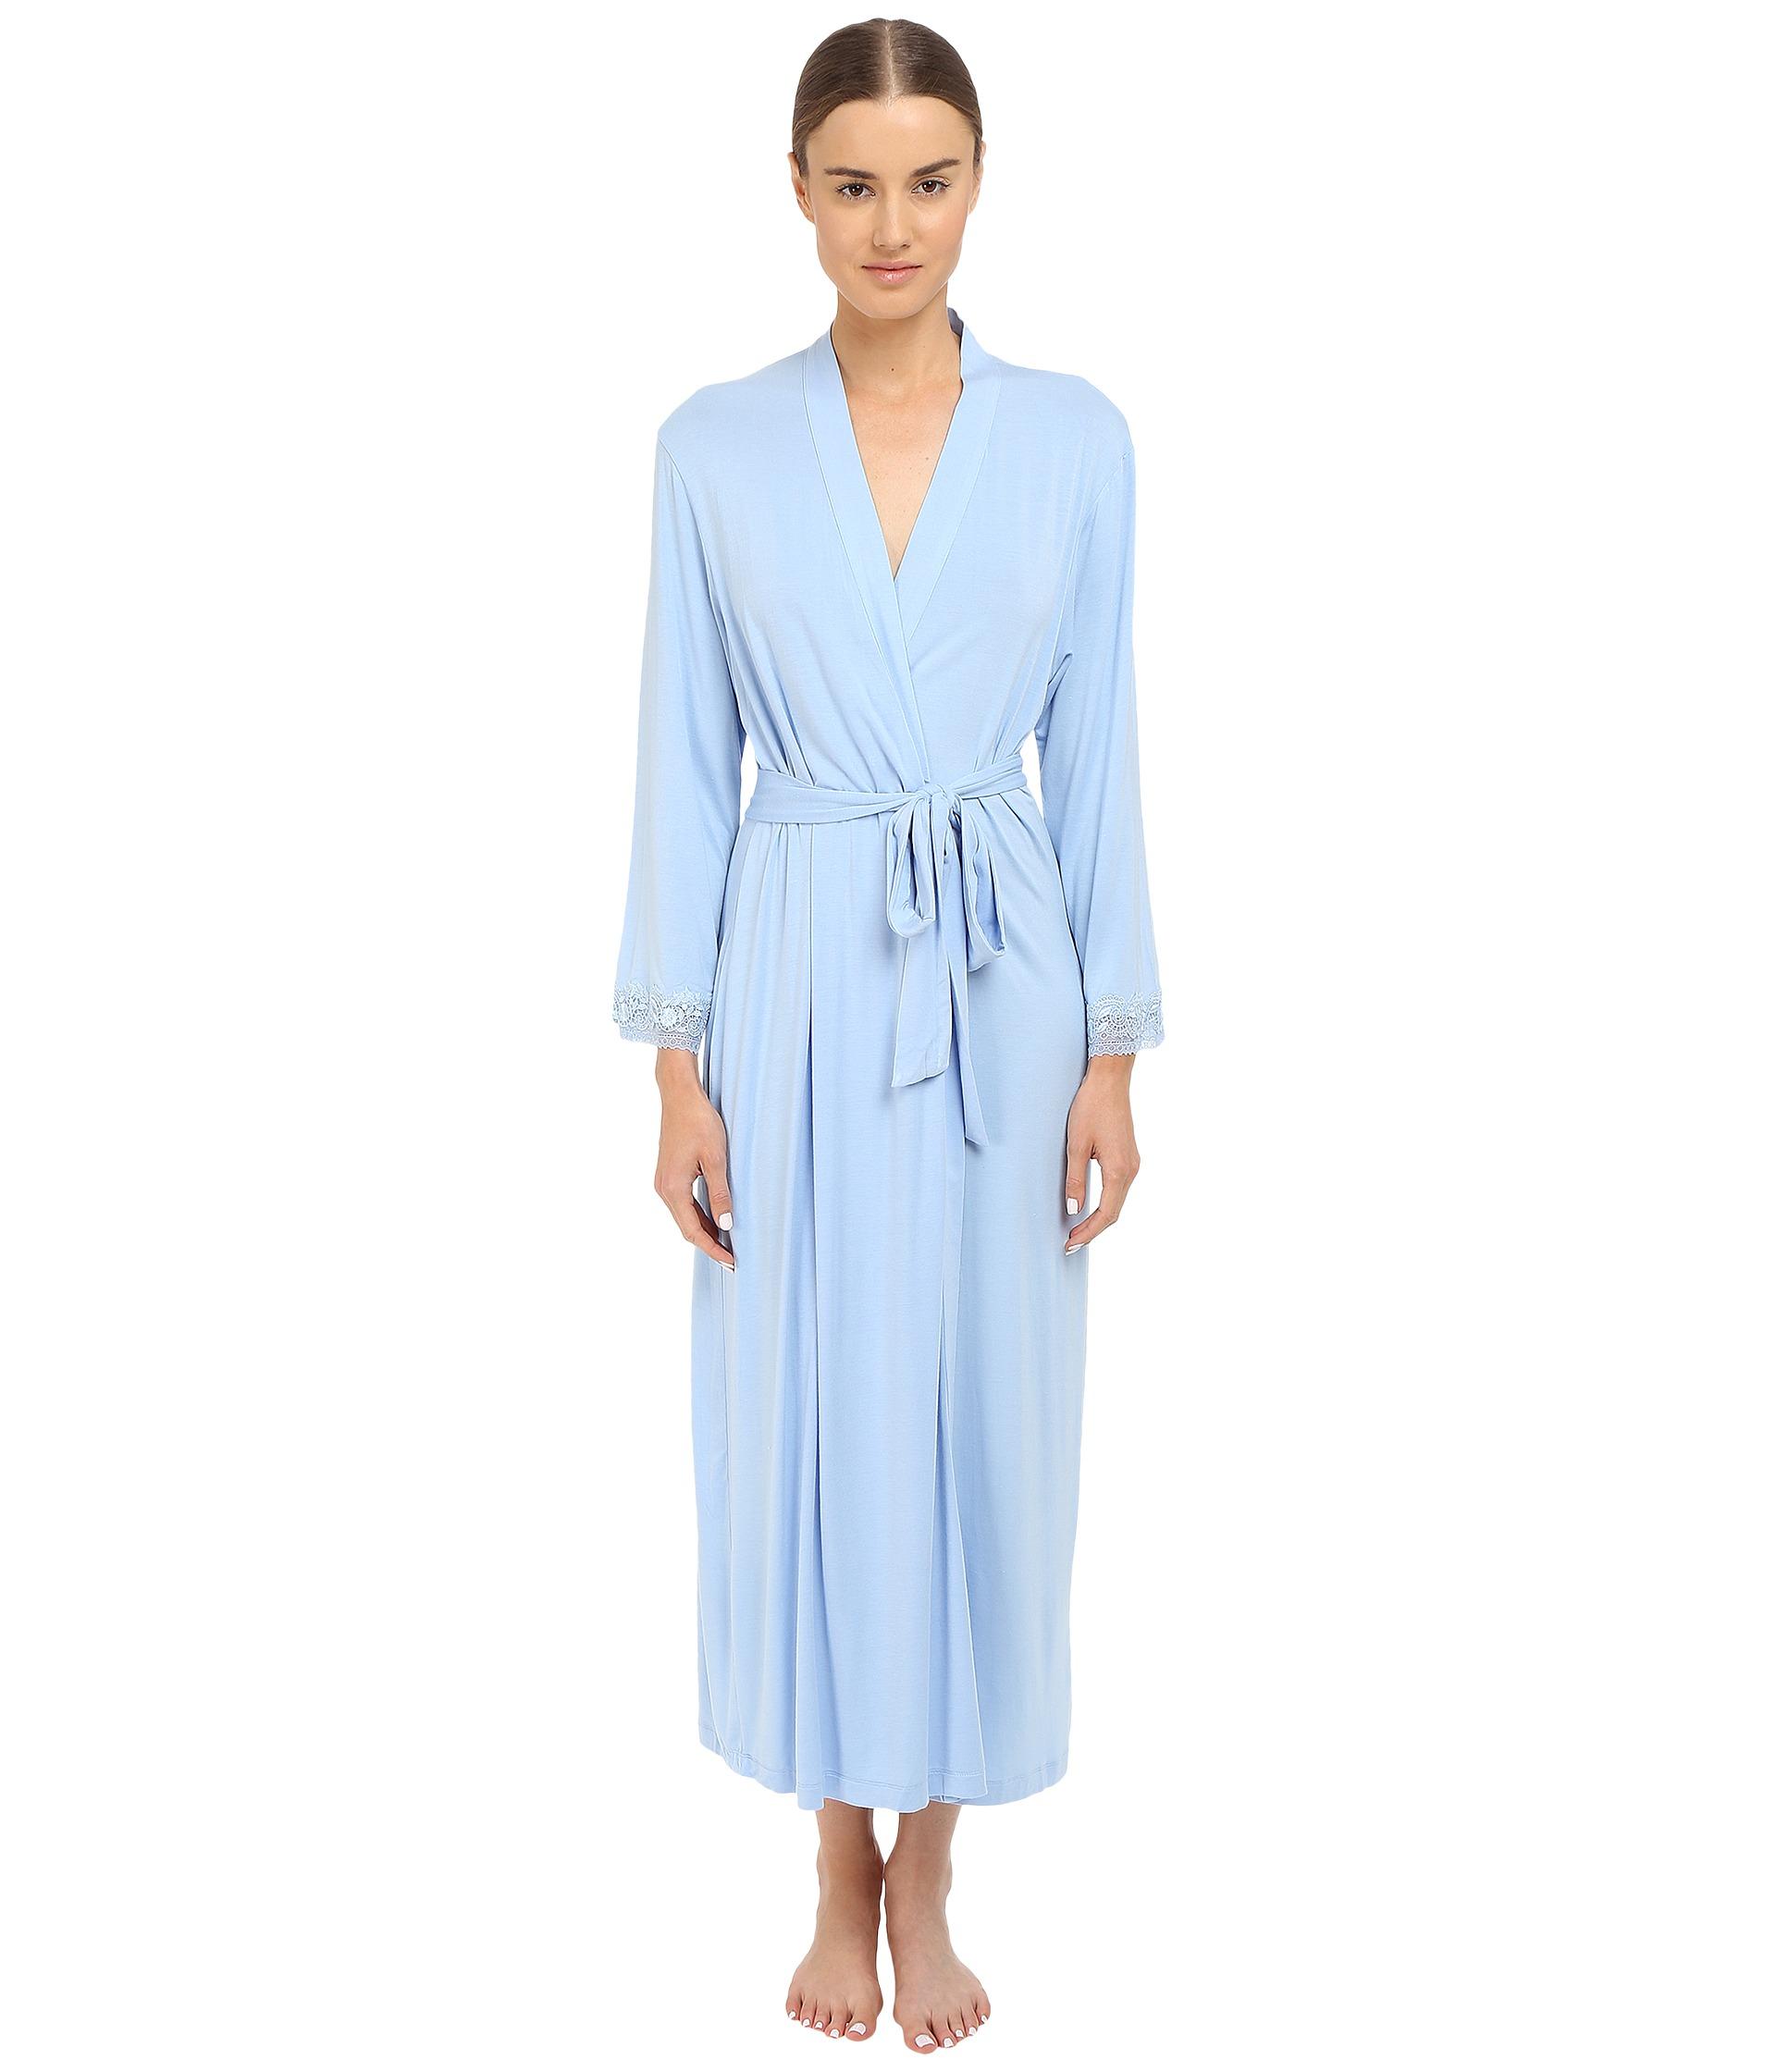 oscar de la renta rayon spandex luxe jersey robe pale blue. Black Bedroom Furniture Sets. Home Design Ideas